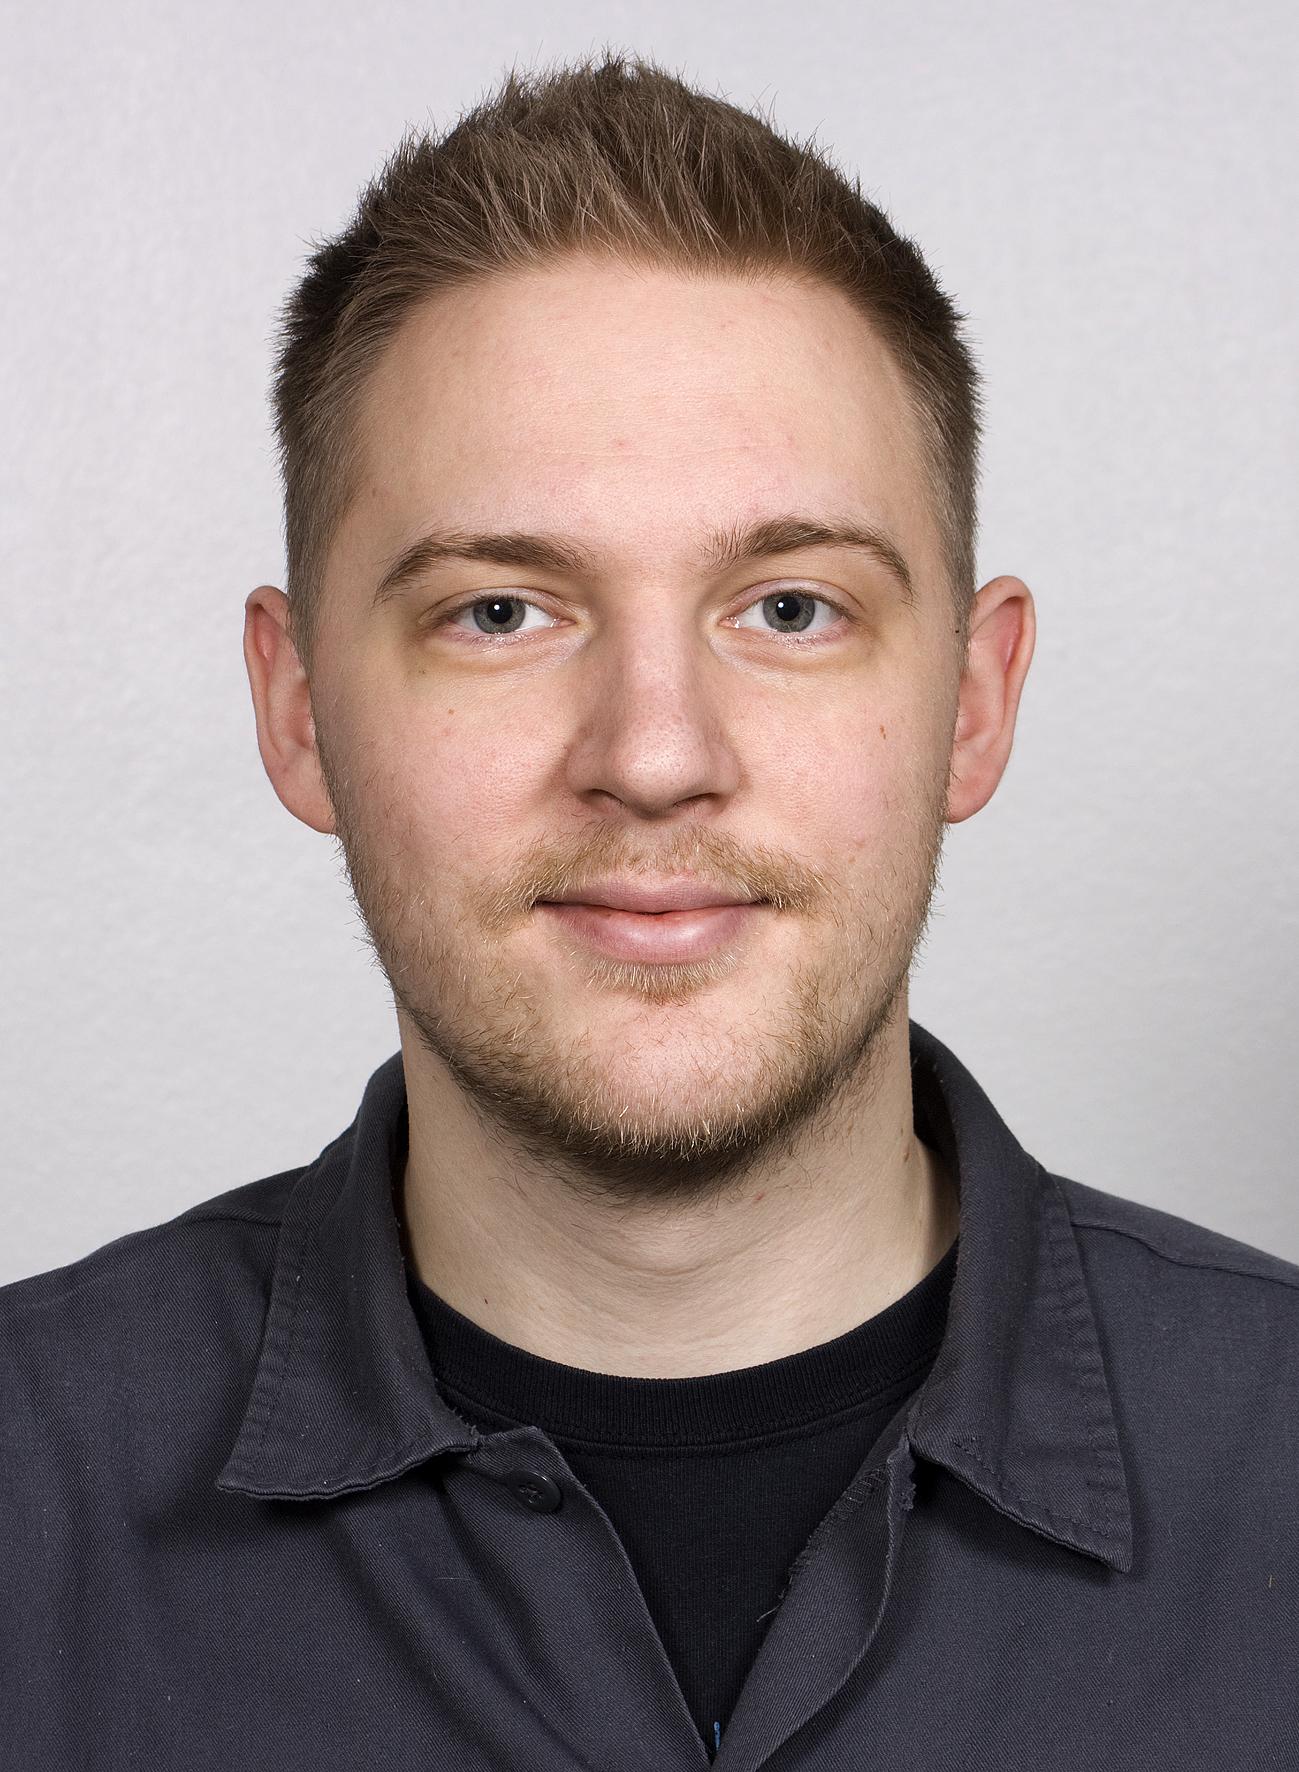 Bilde av Teigen, Morten